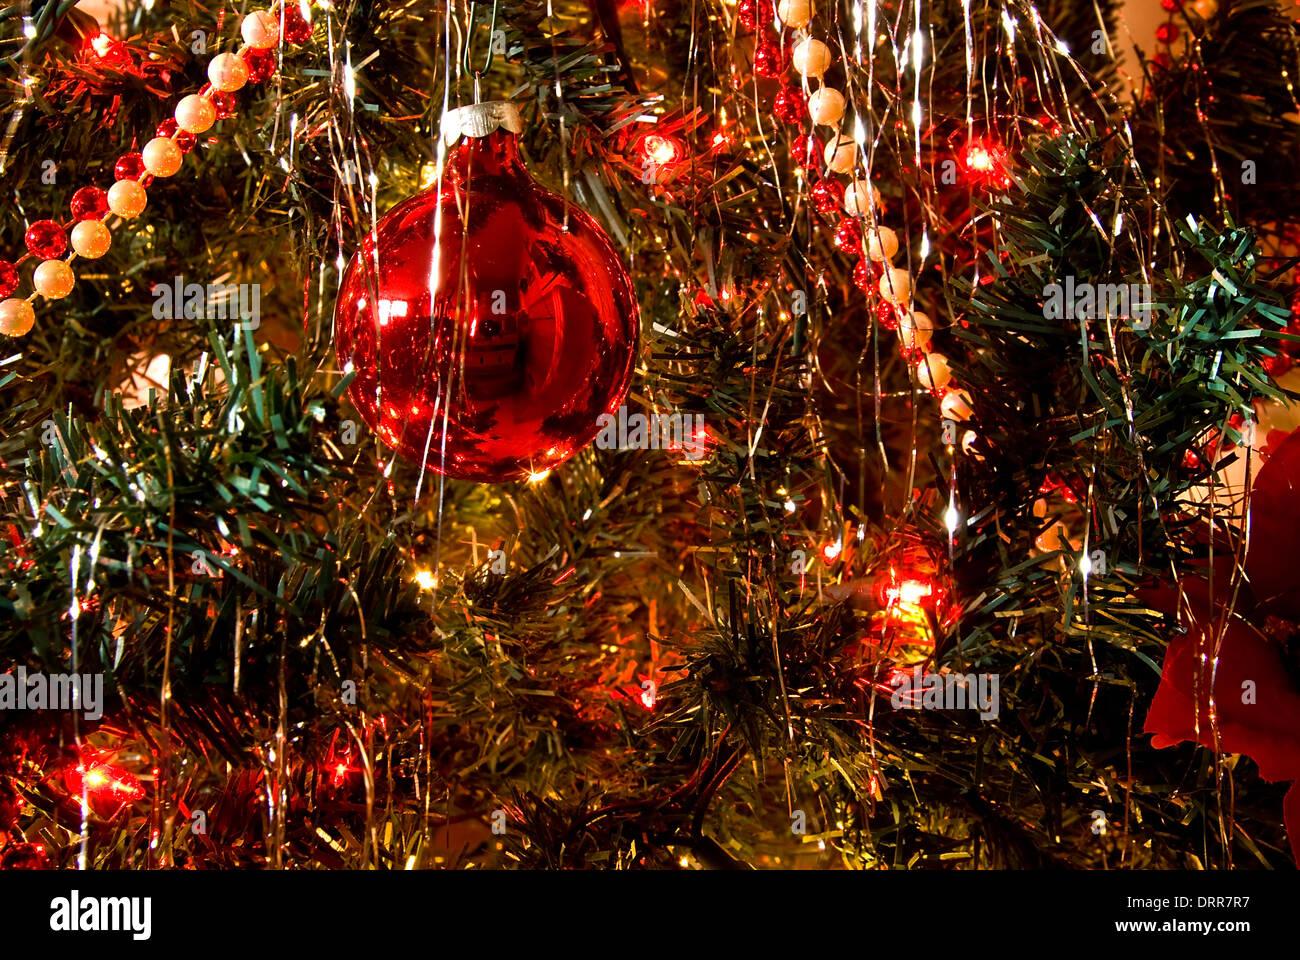 Tinsel garland christmas decorations stock photos tinsel garland